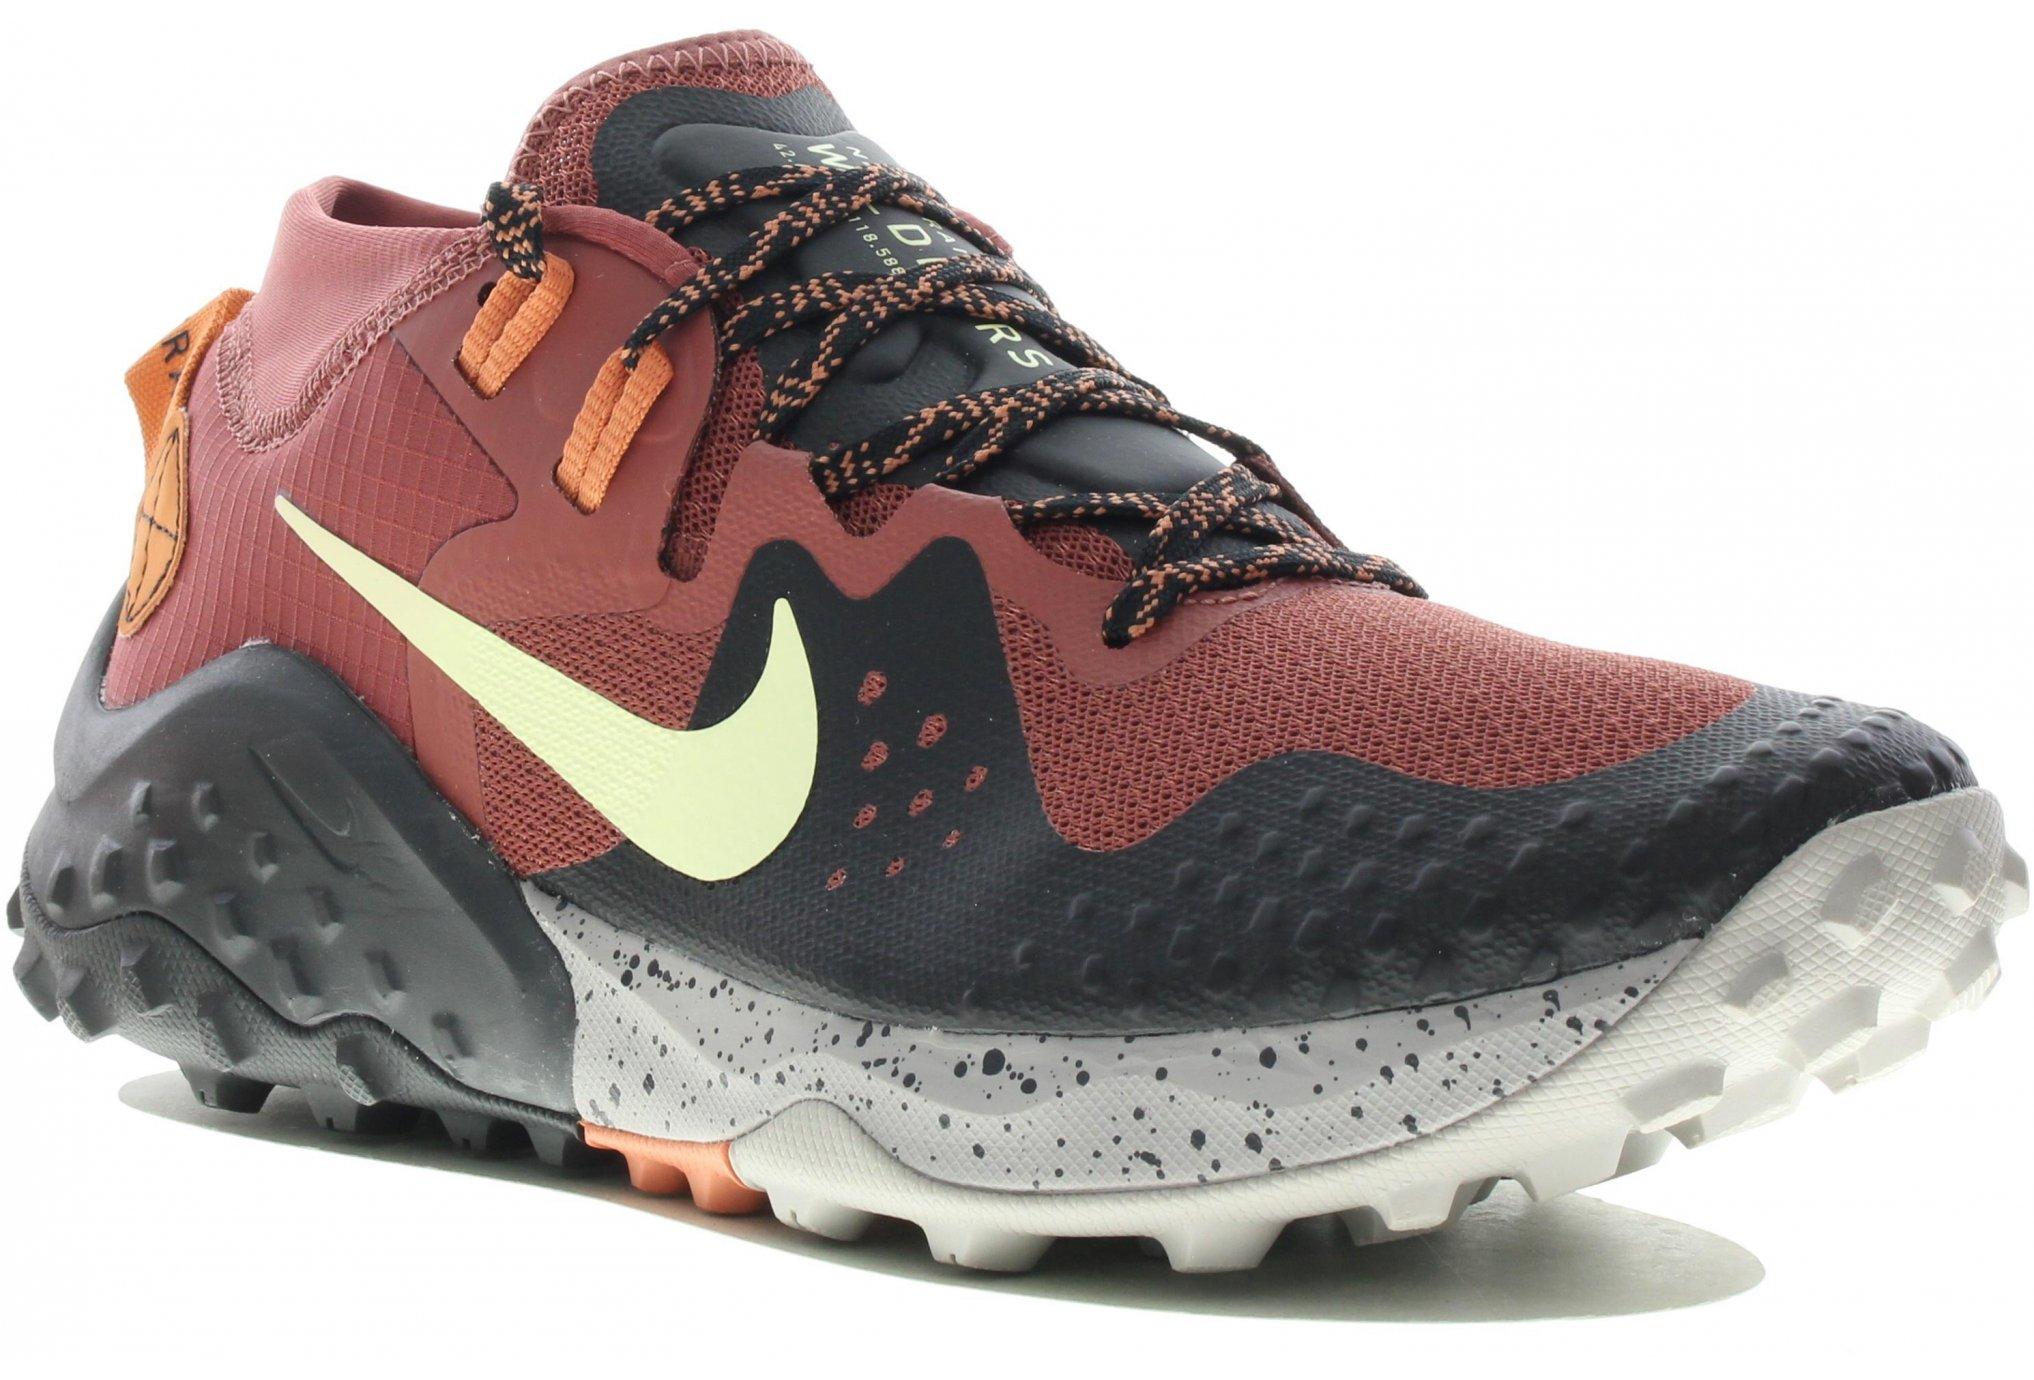 Nike Wildhorse 6 M Chaussures homme